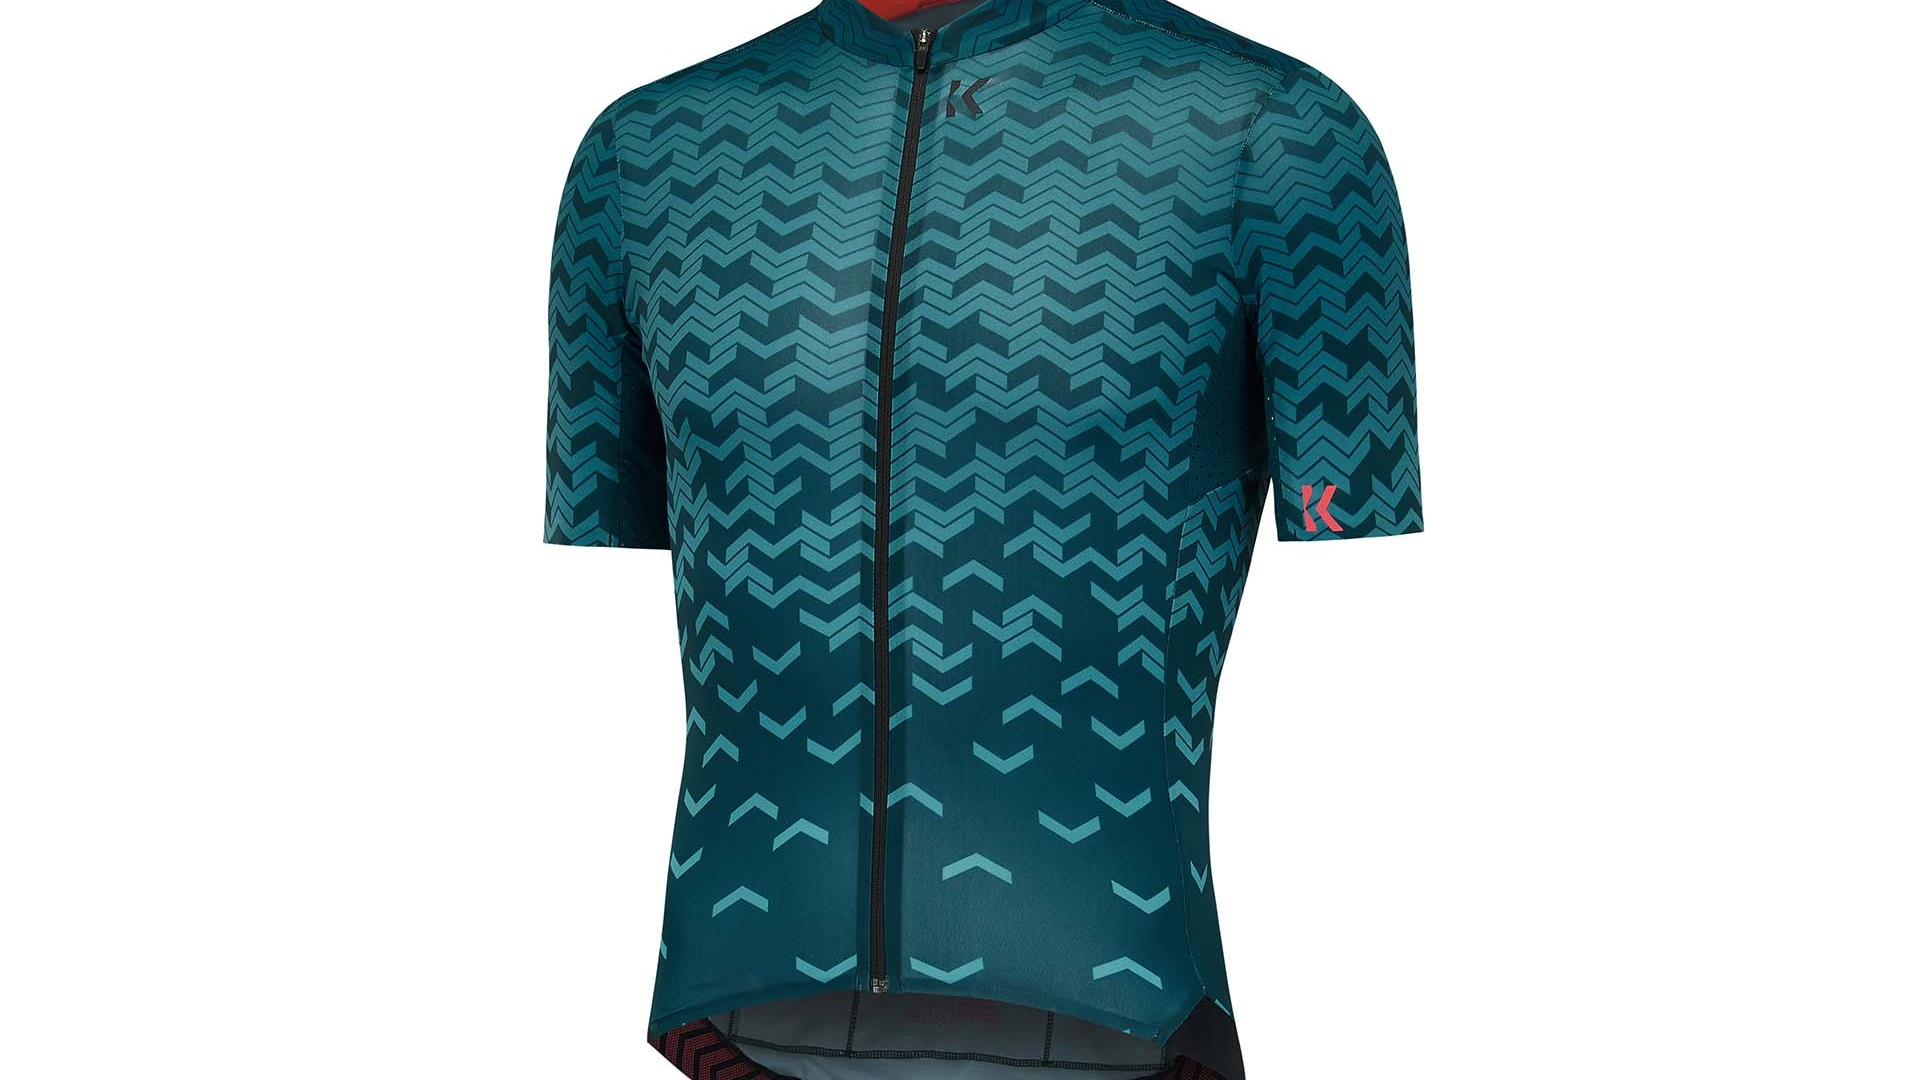 Flux Chevron jersey